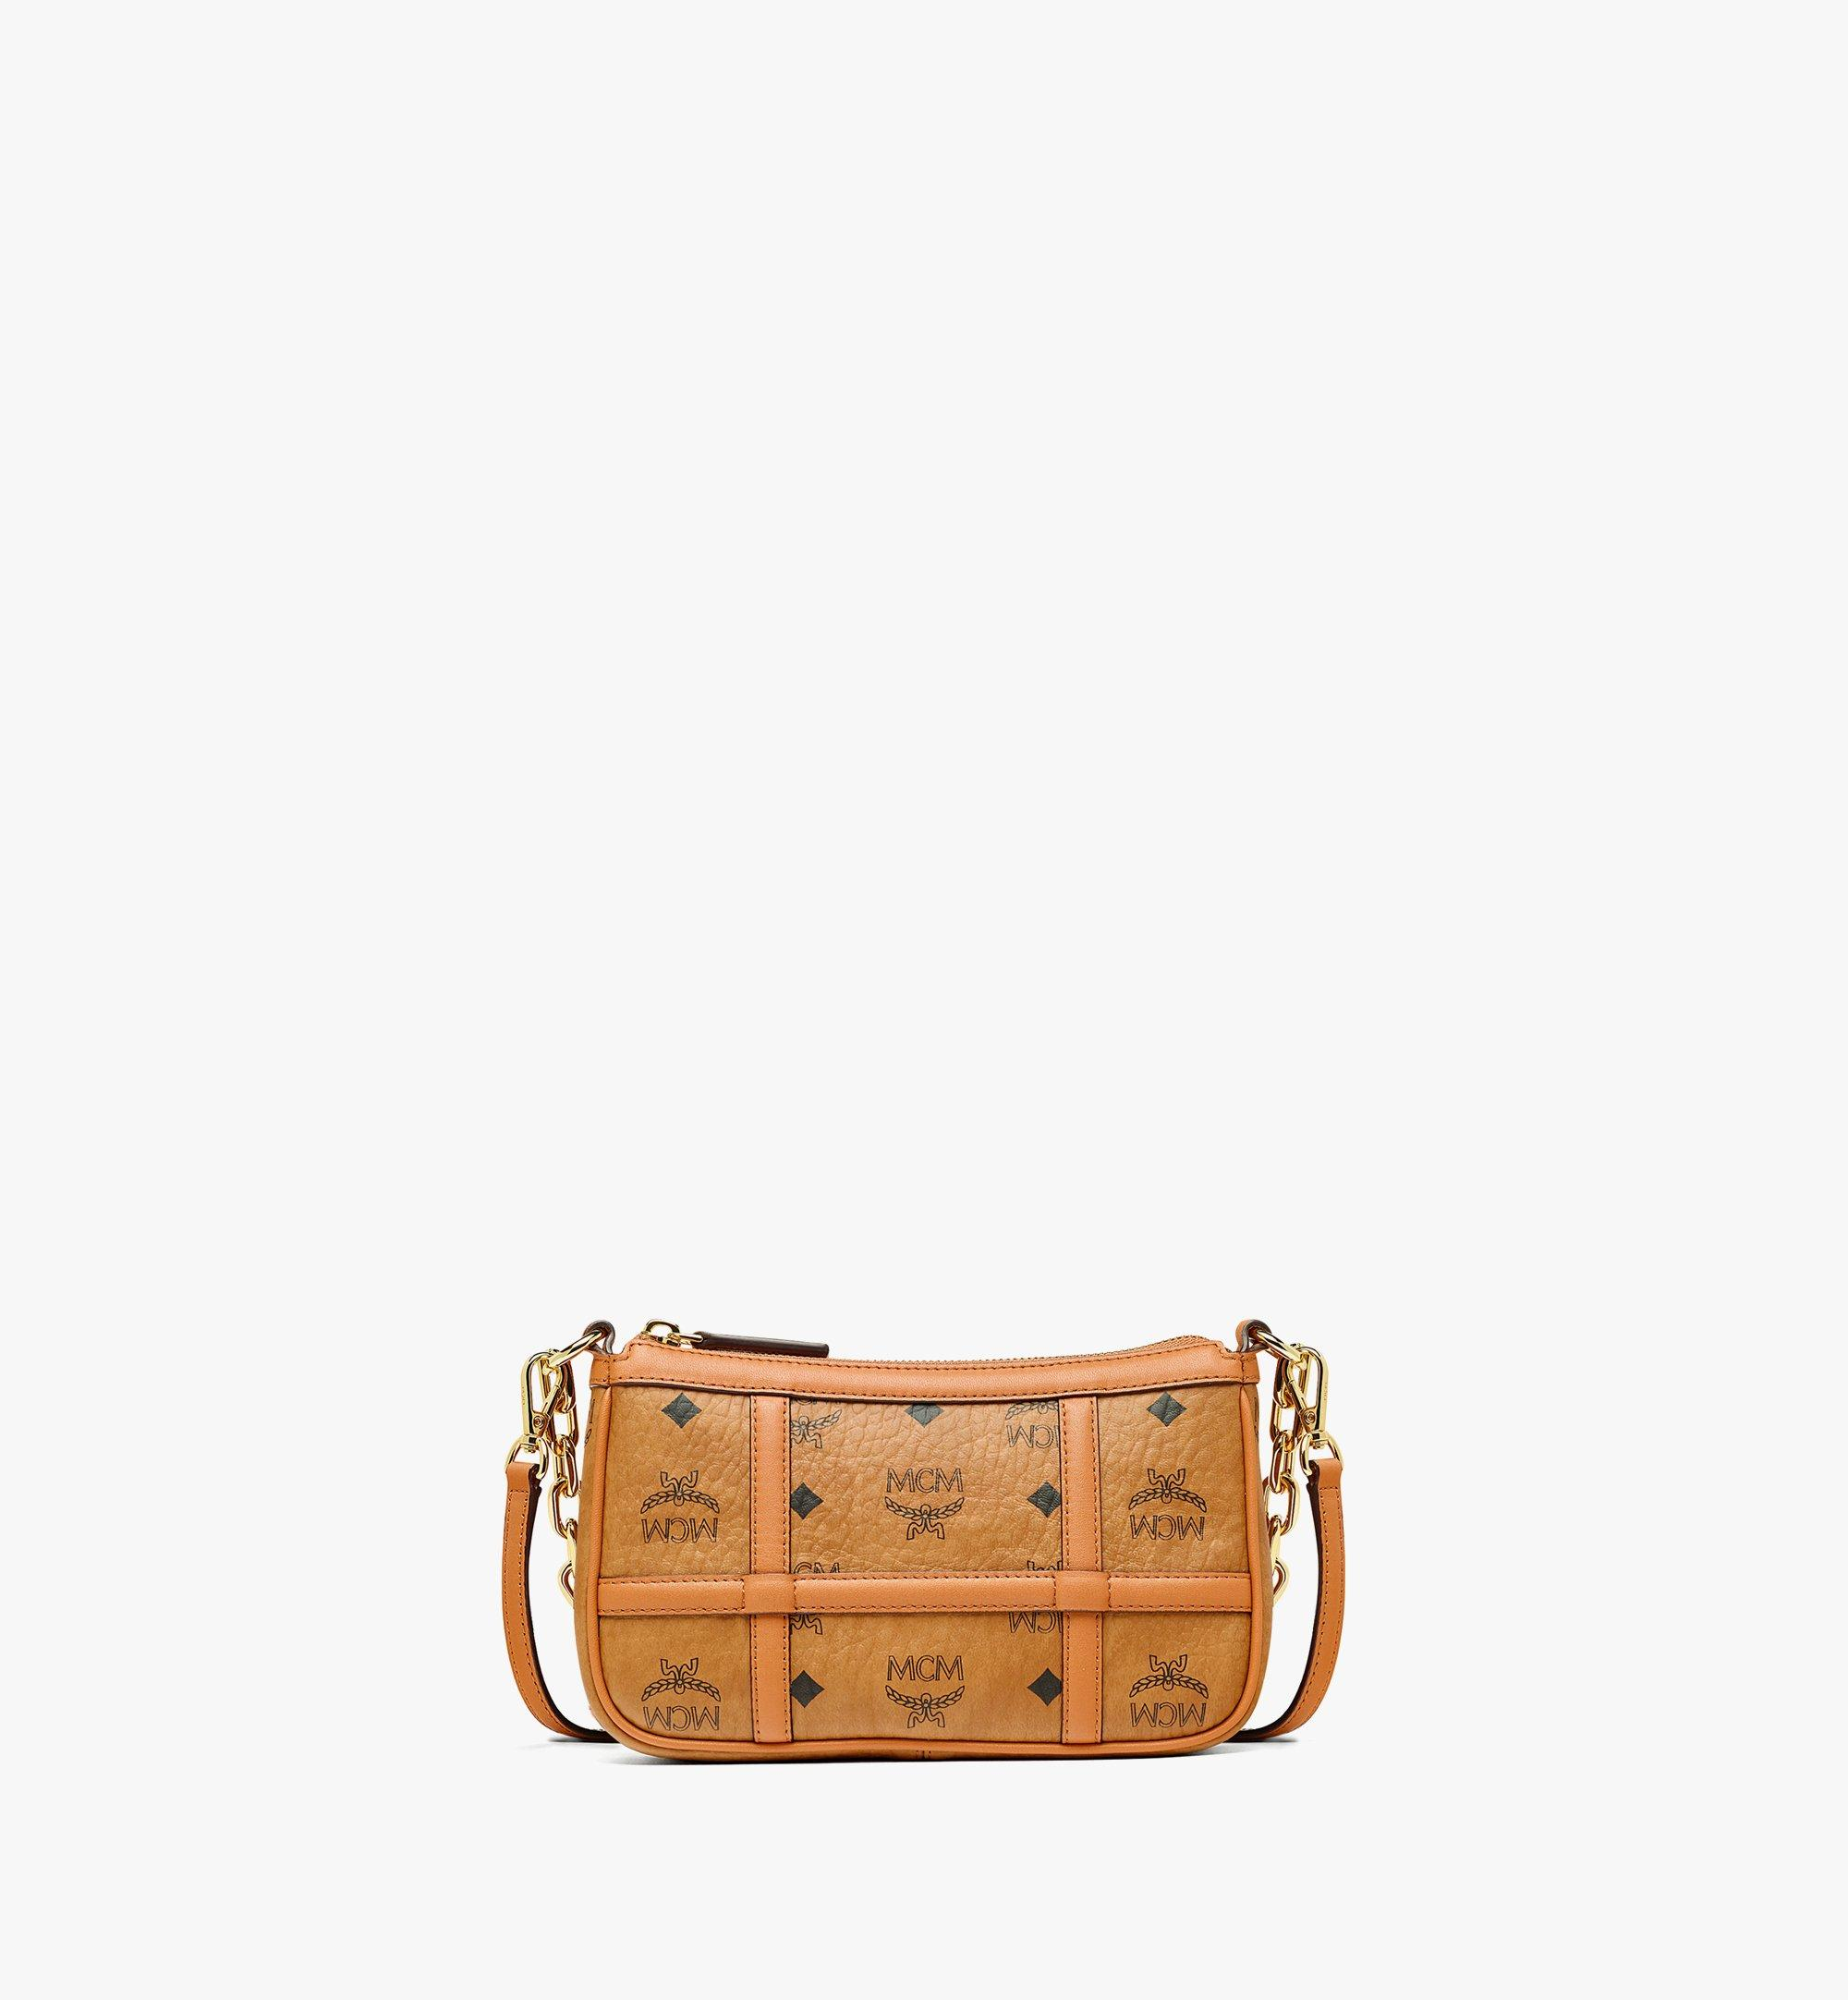 MCM Delmy Shoulder Bag in Visetos Cognac MWSBAER01CO001 Alternate View 1